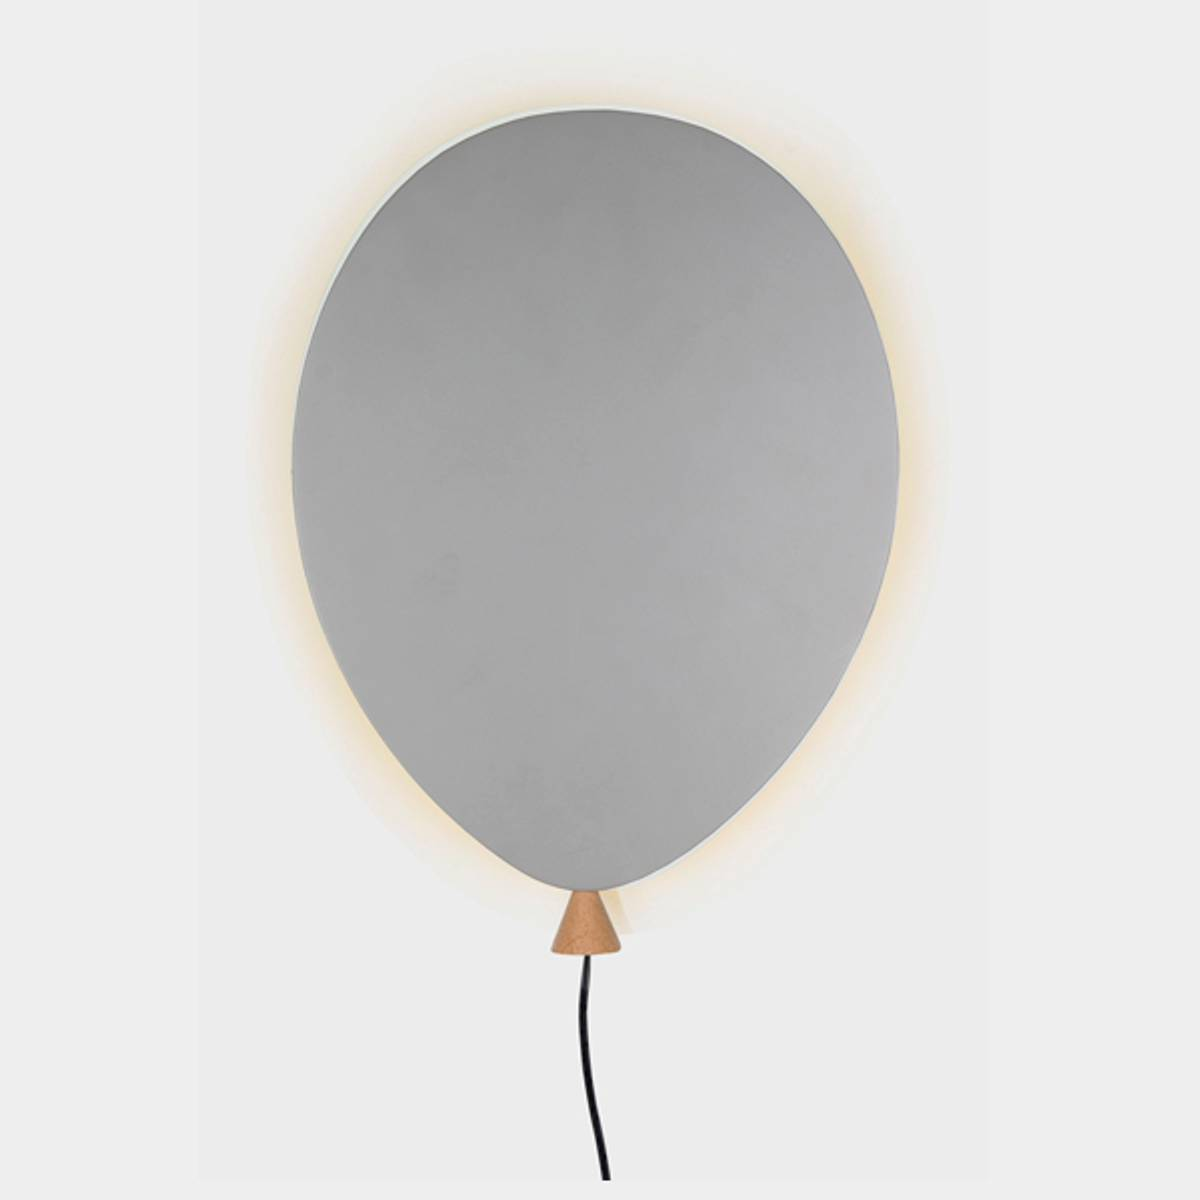 Vegglampe Ballong Grå